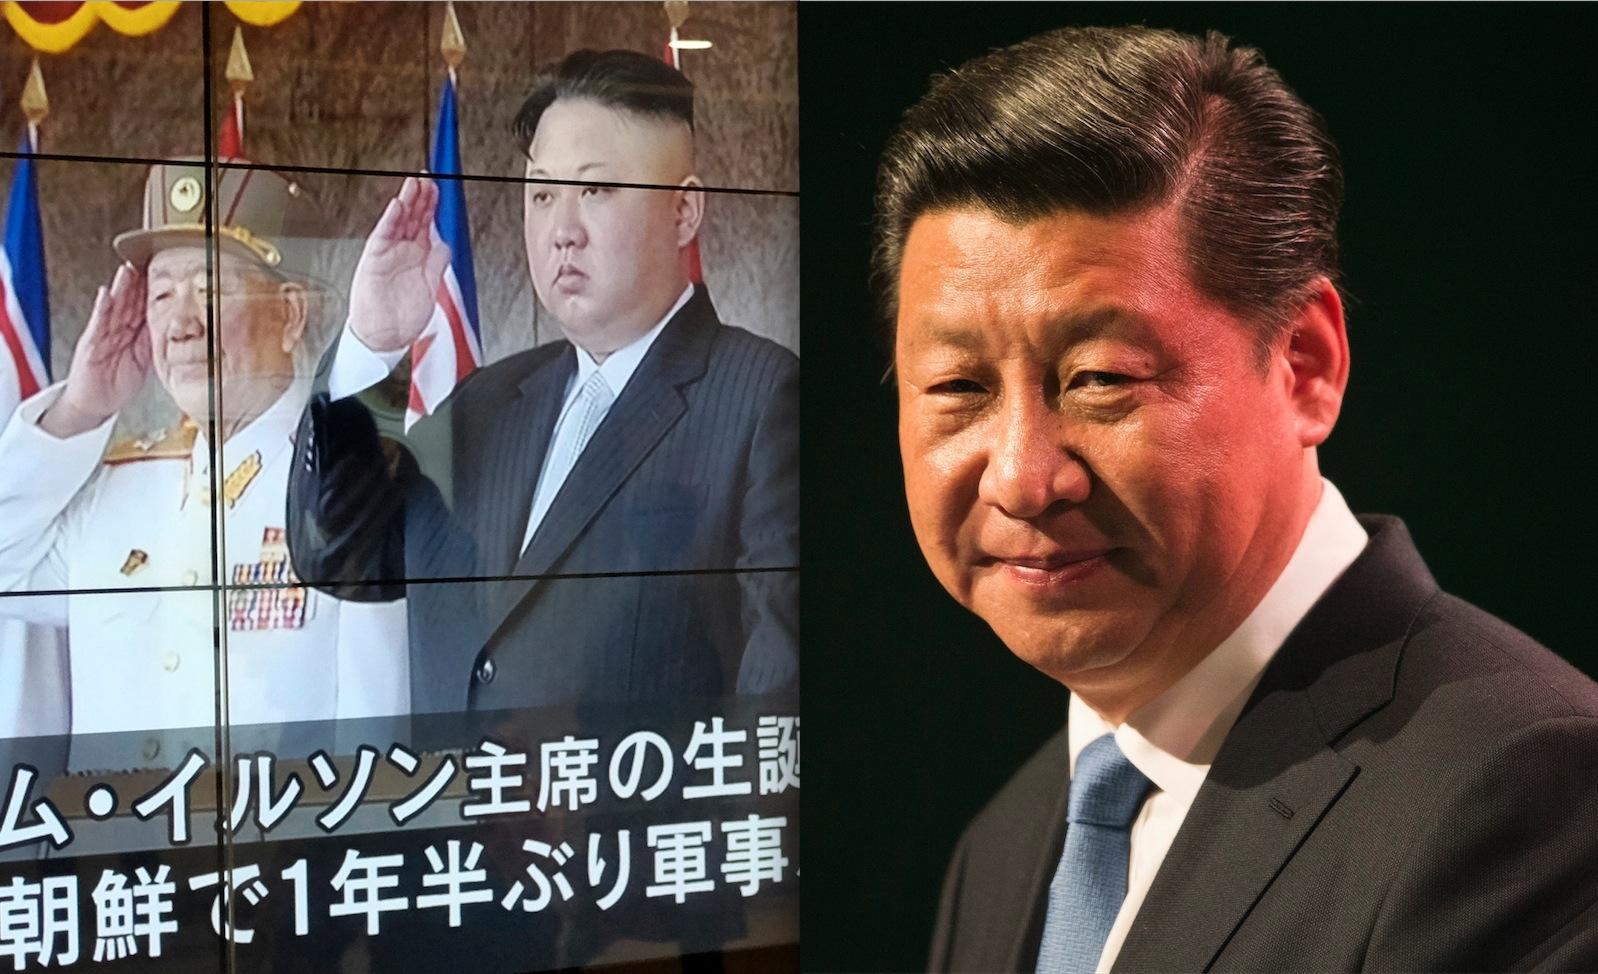 Nordkorea-Spezial: Geheime Machtspiele mit Atomwaffen – Kim Jong Un ist Xi Jinpings großes Problem